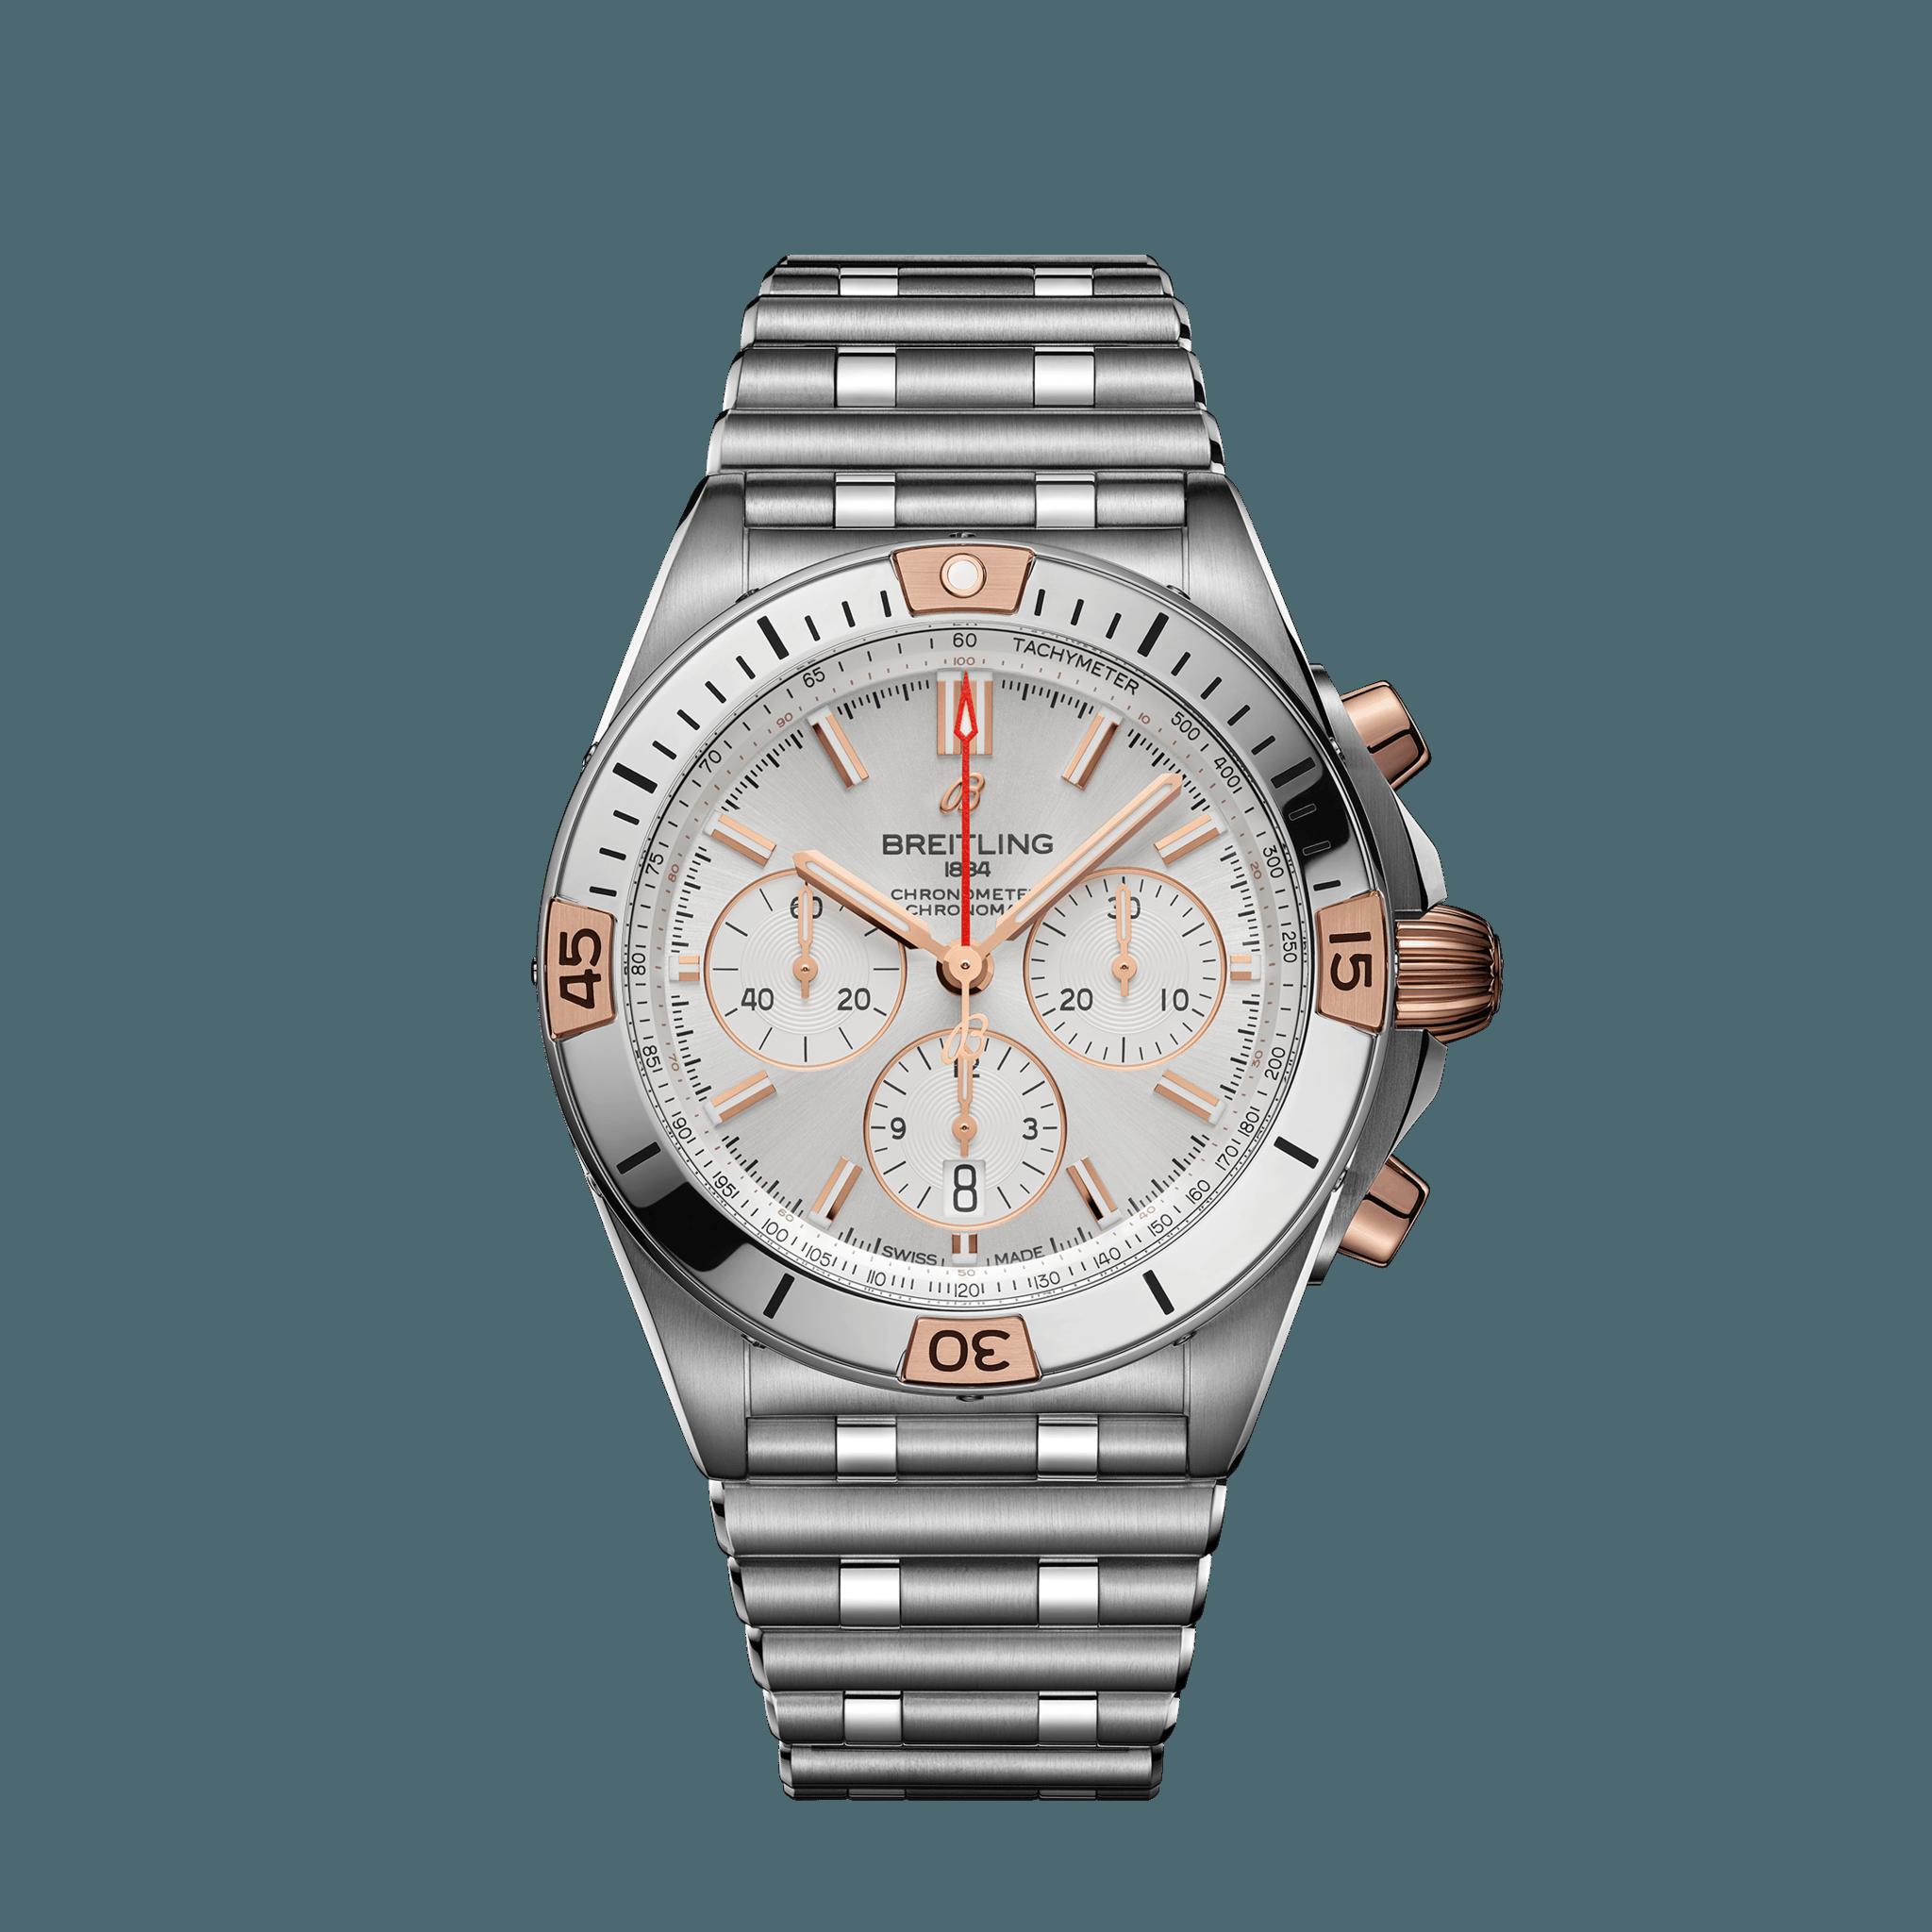 Breitling  Chronomat B01 42 - Edelstahl und 18-karätiges Rotgold